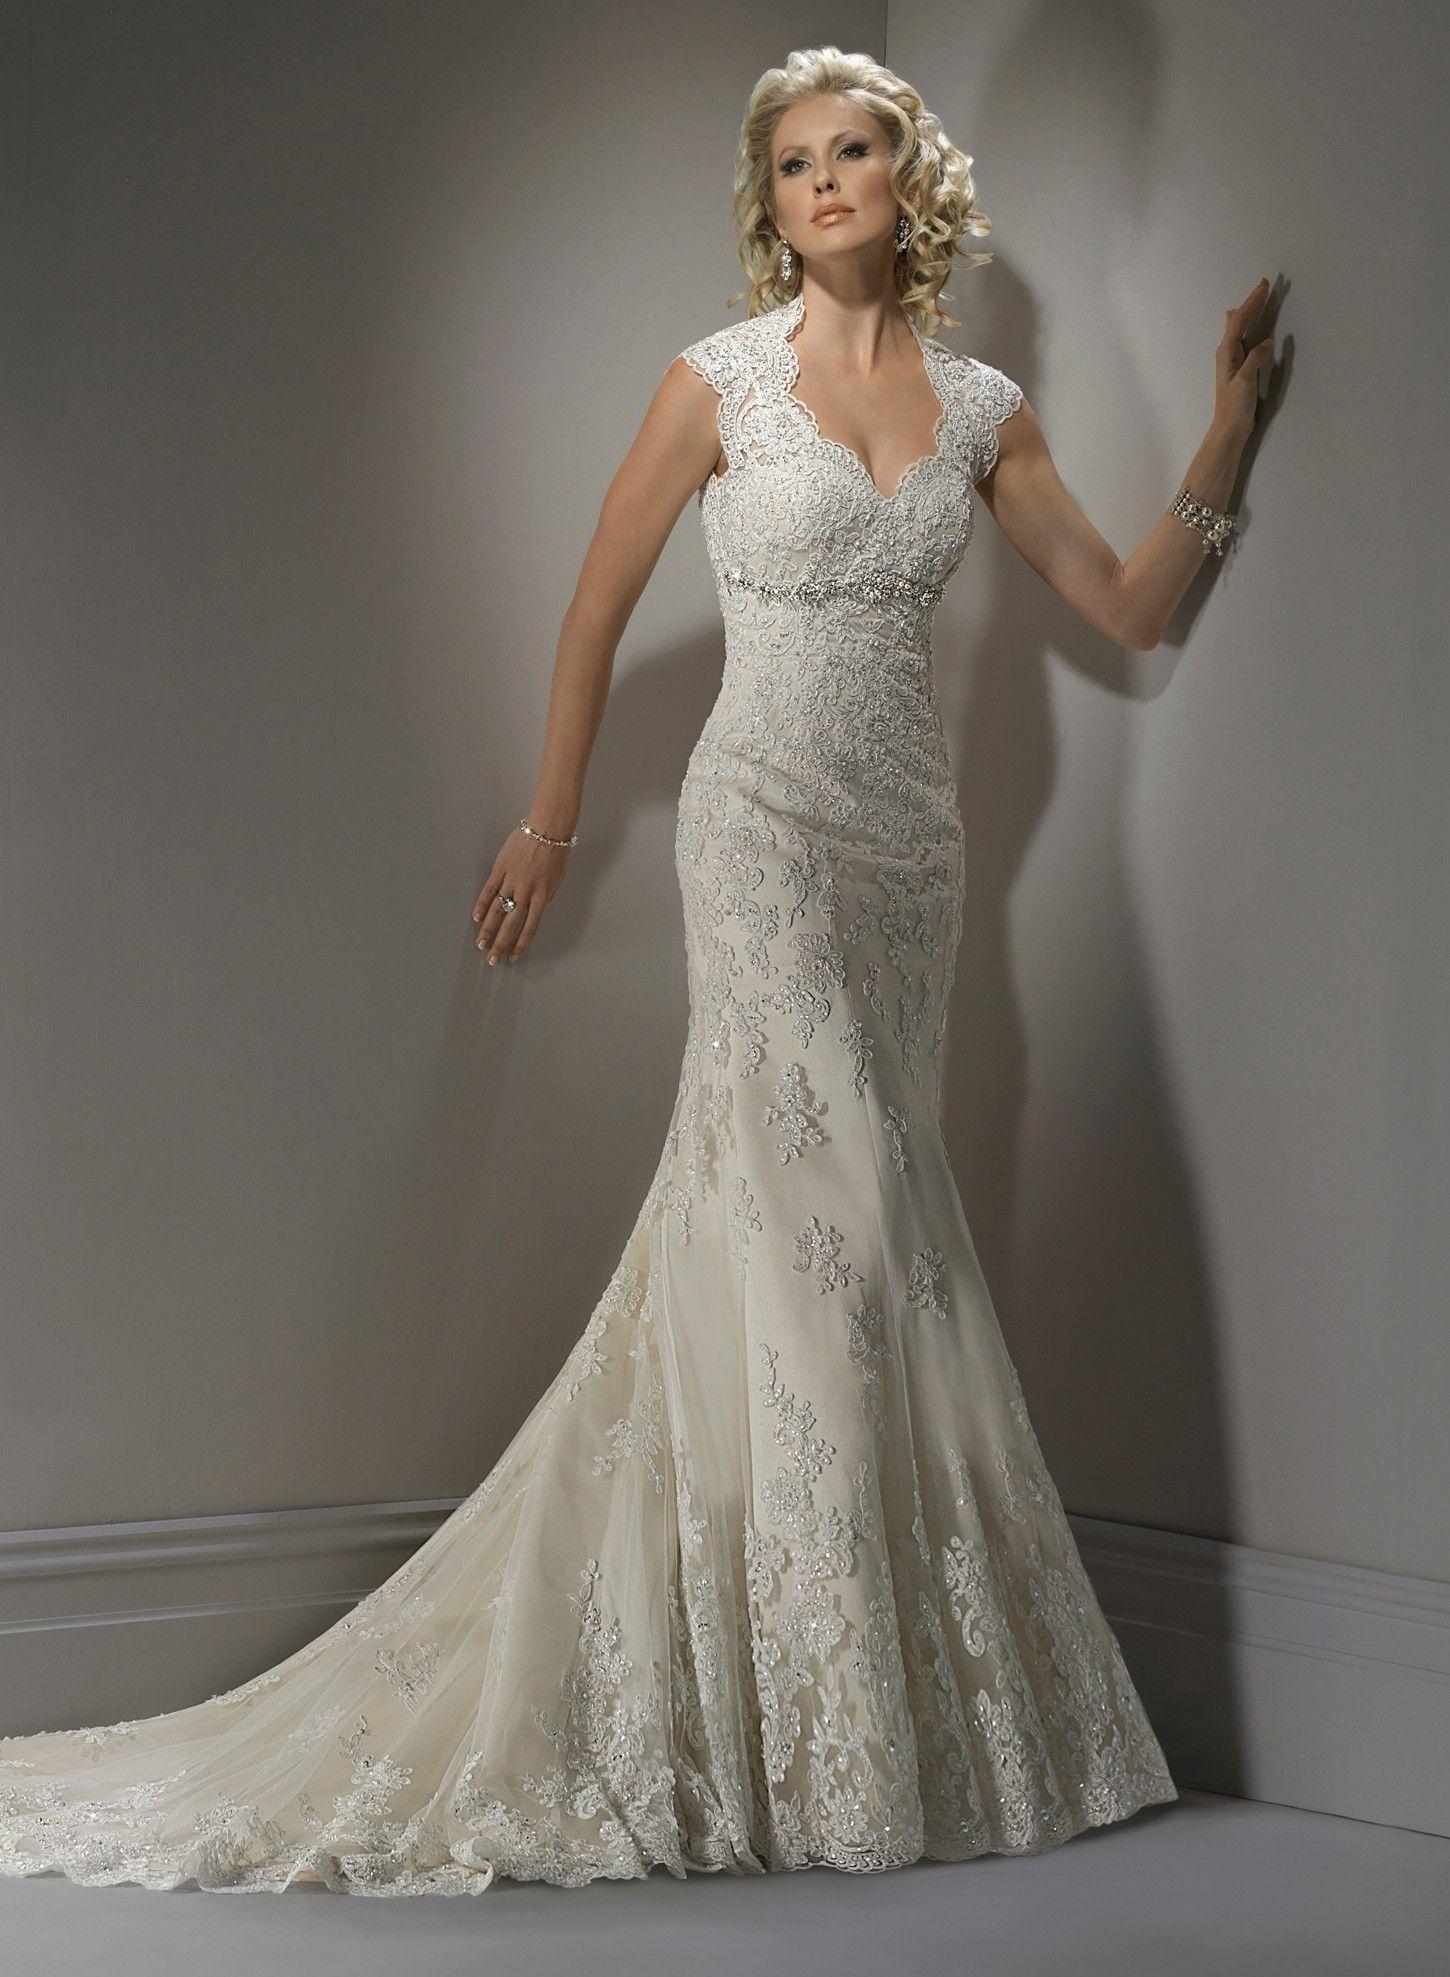 Beautiful lace wedding gown wedding dresses pinterest lace